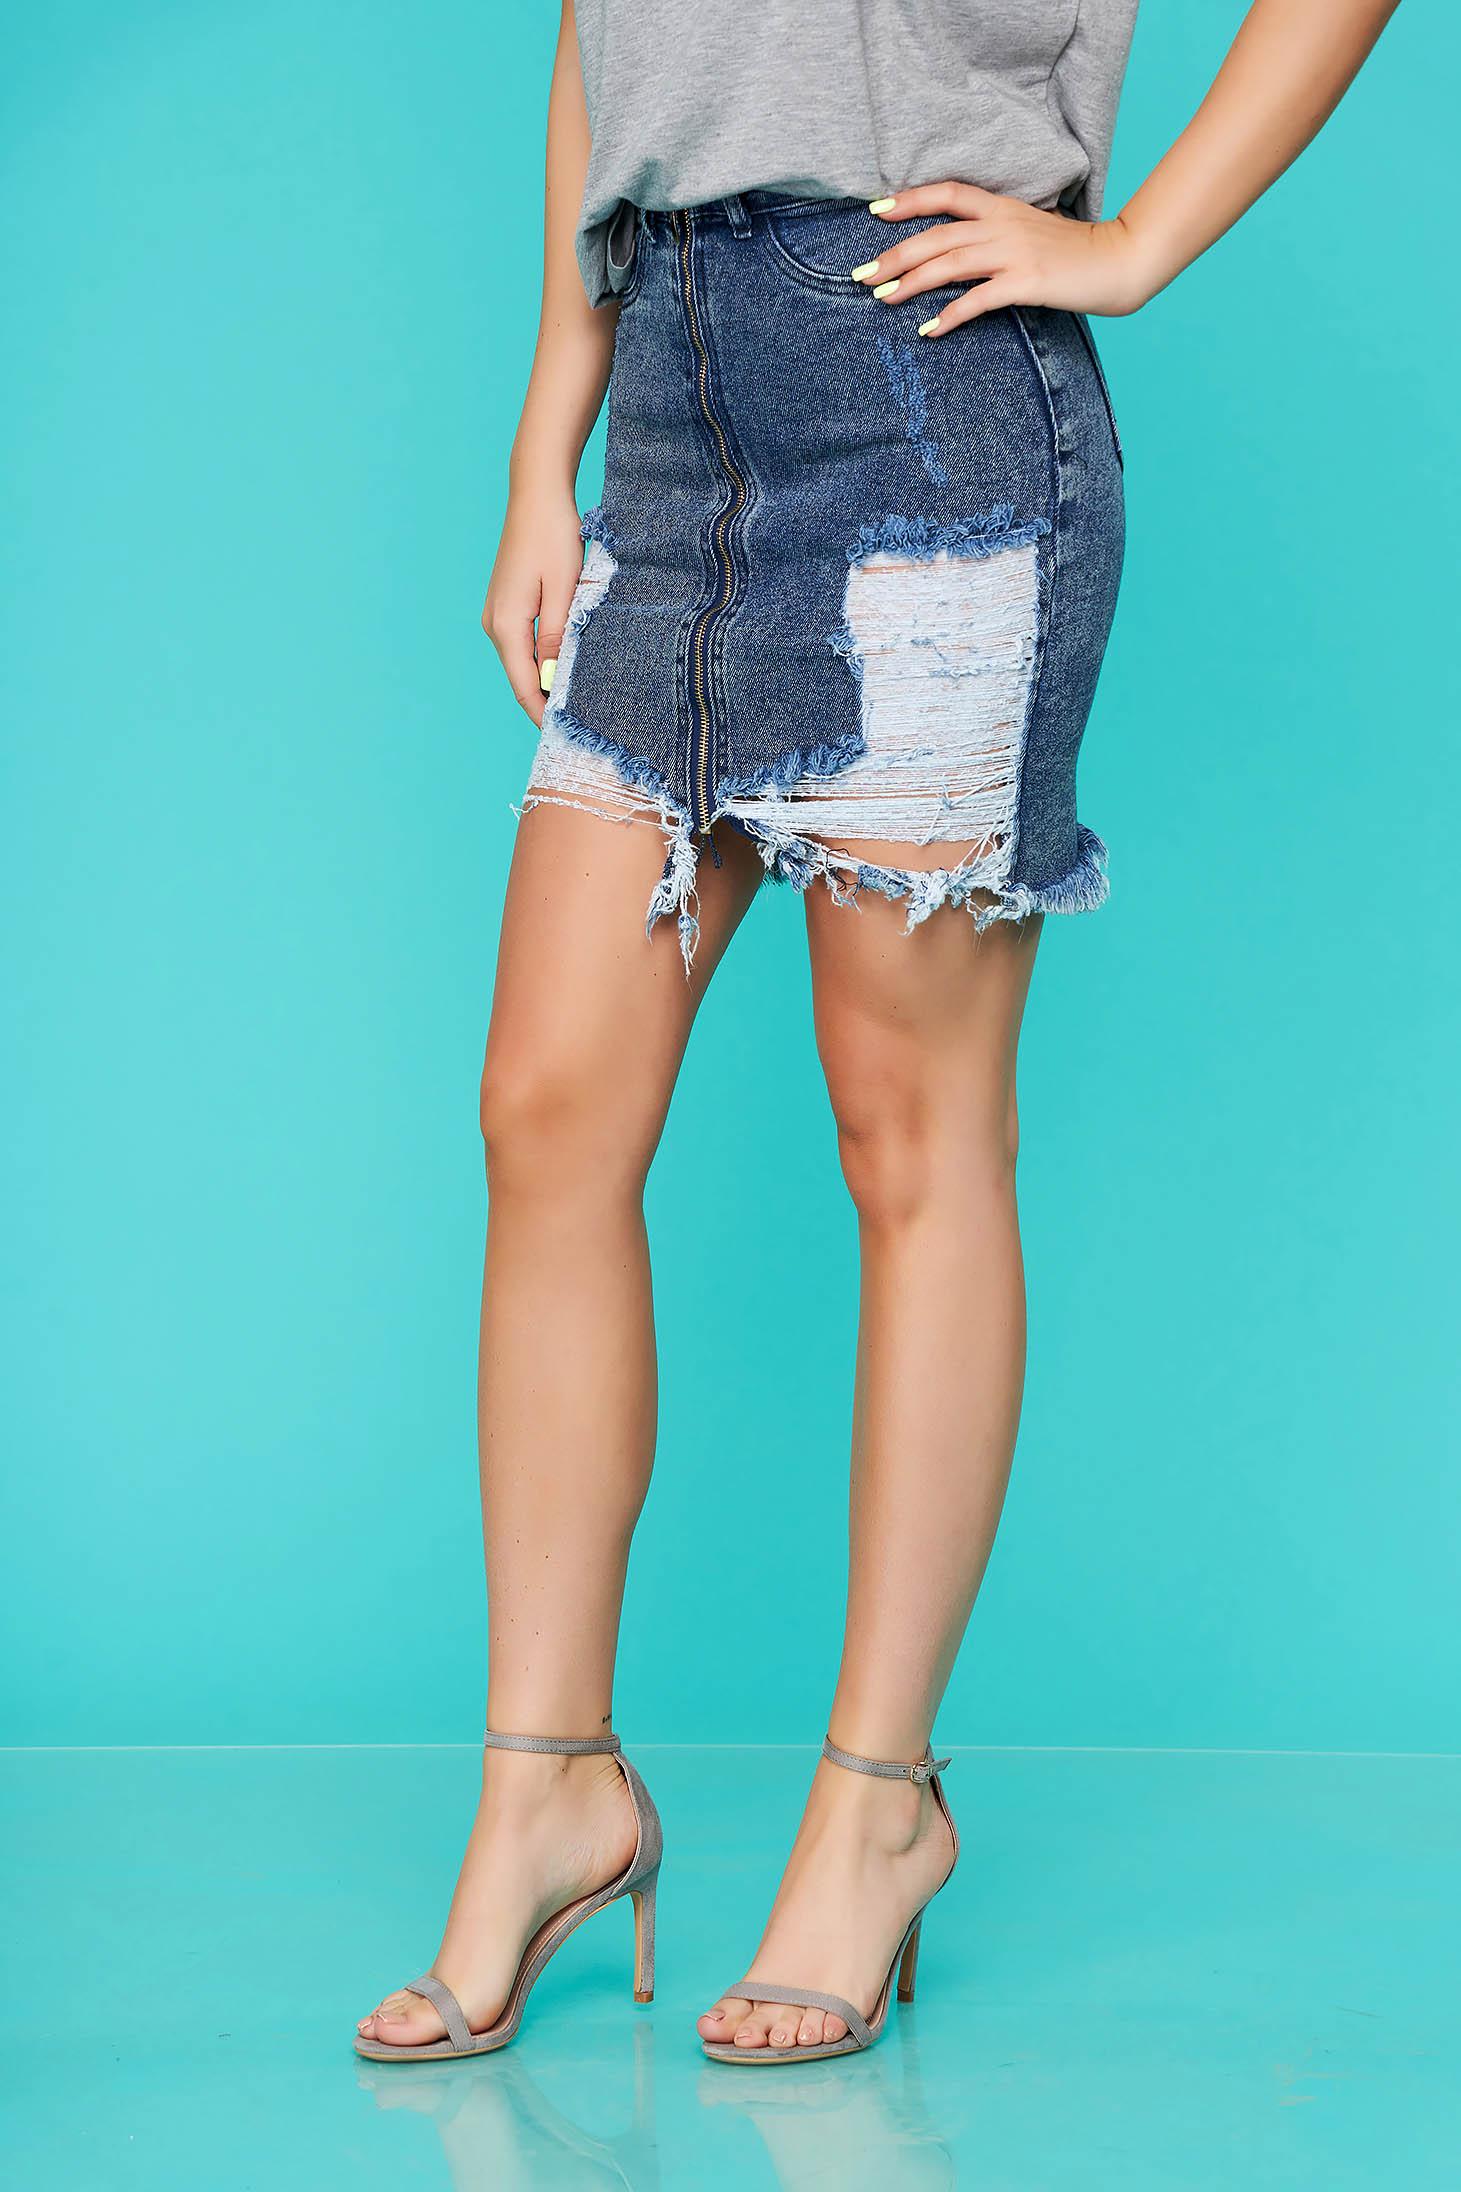 Blue skirt short cut denim ripped